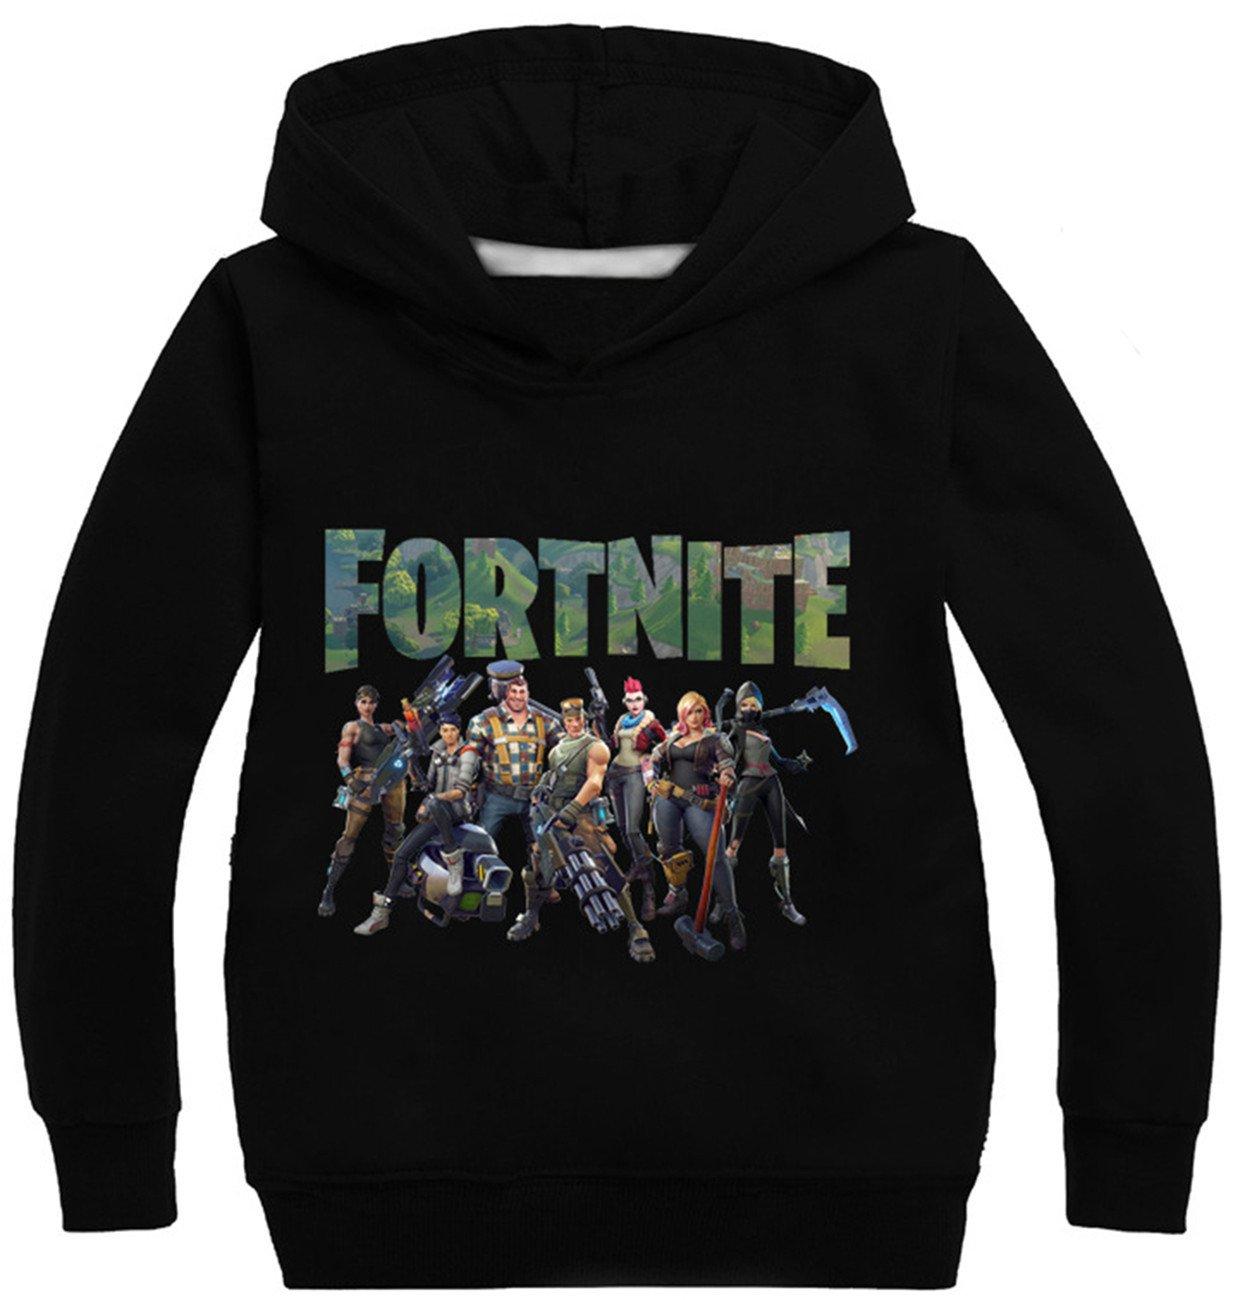 SERAPHY Fortnite Hoodies Teen Jumpers Wonderful Gifts for Boys 58-Black 160